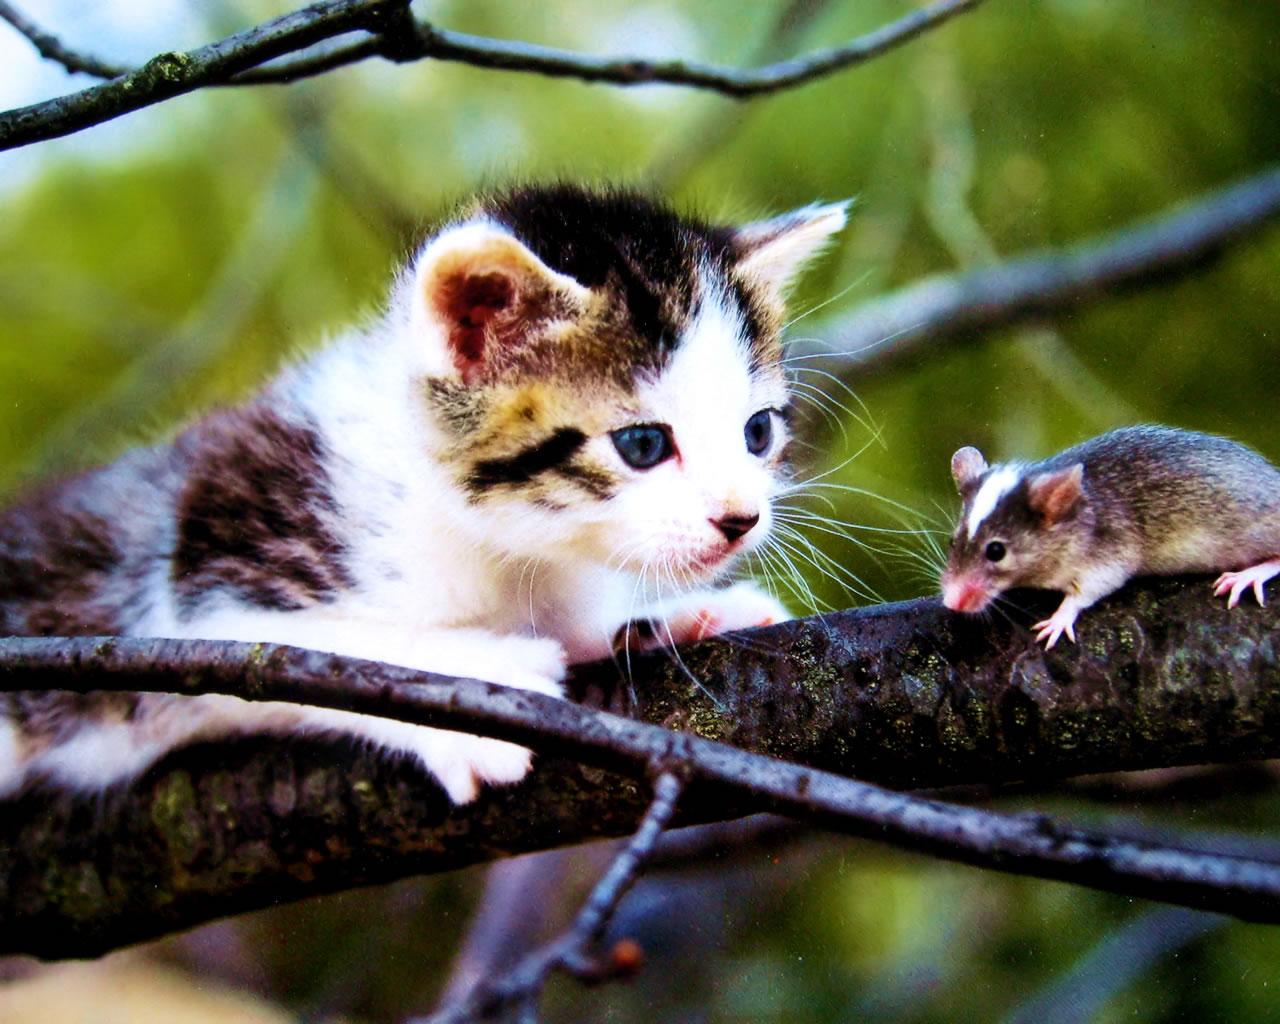 download wallpaper: kitten en muis wallpaper